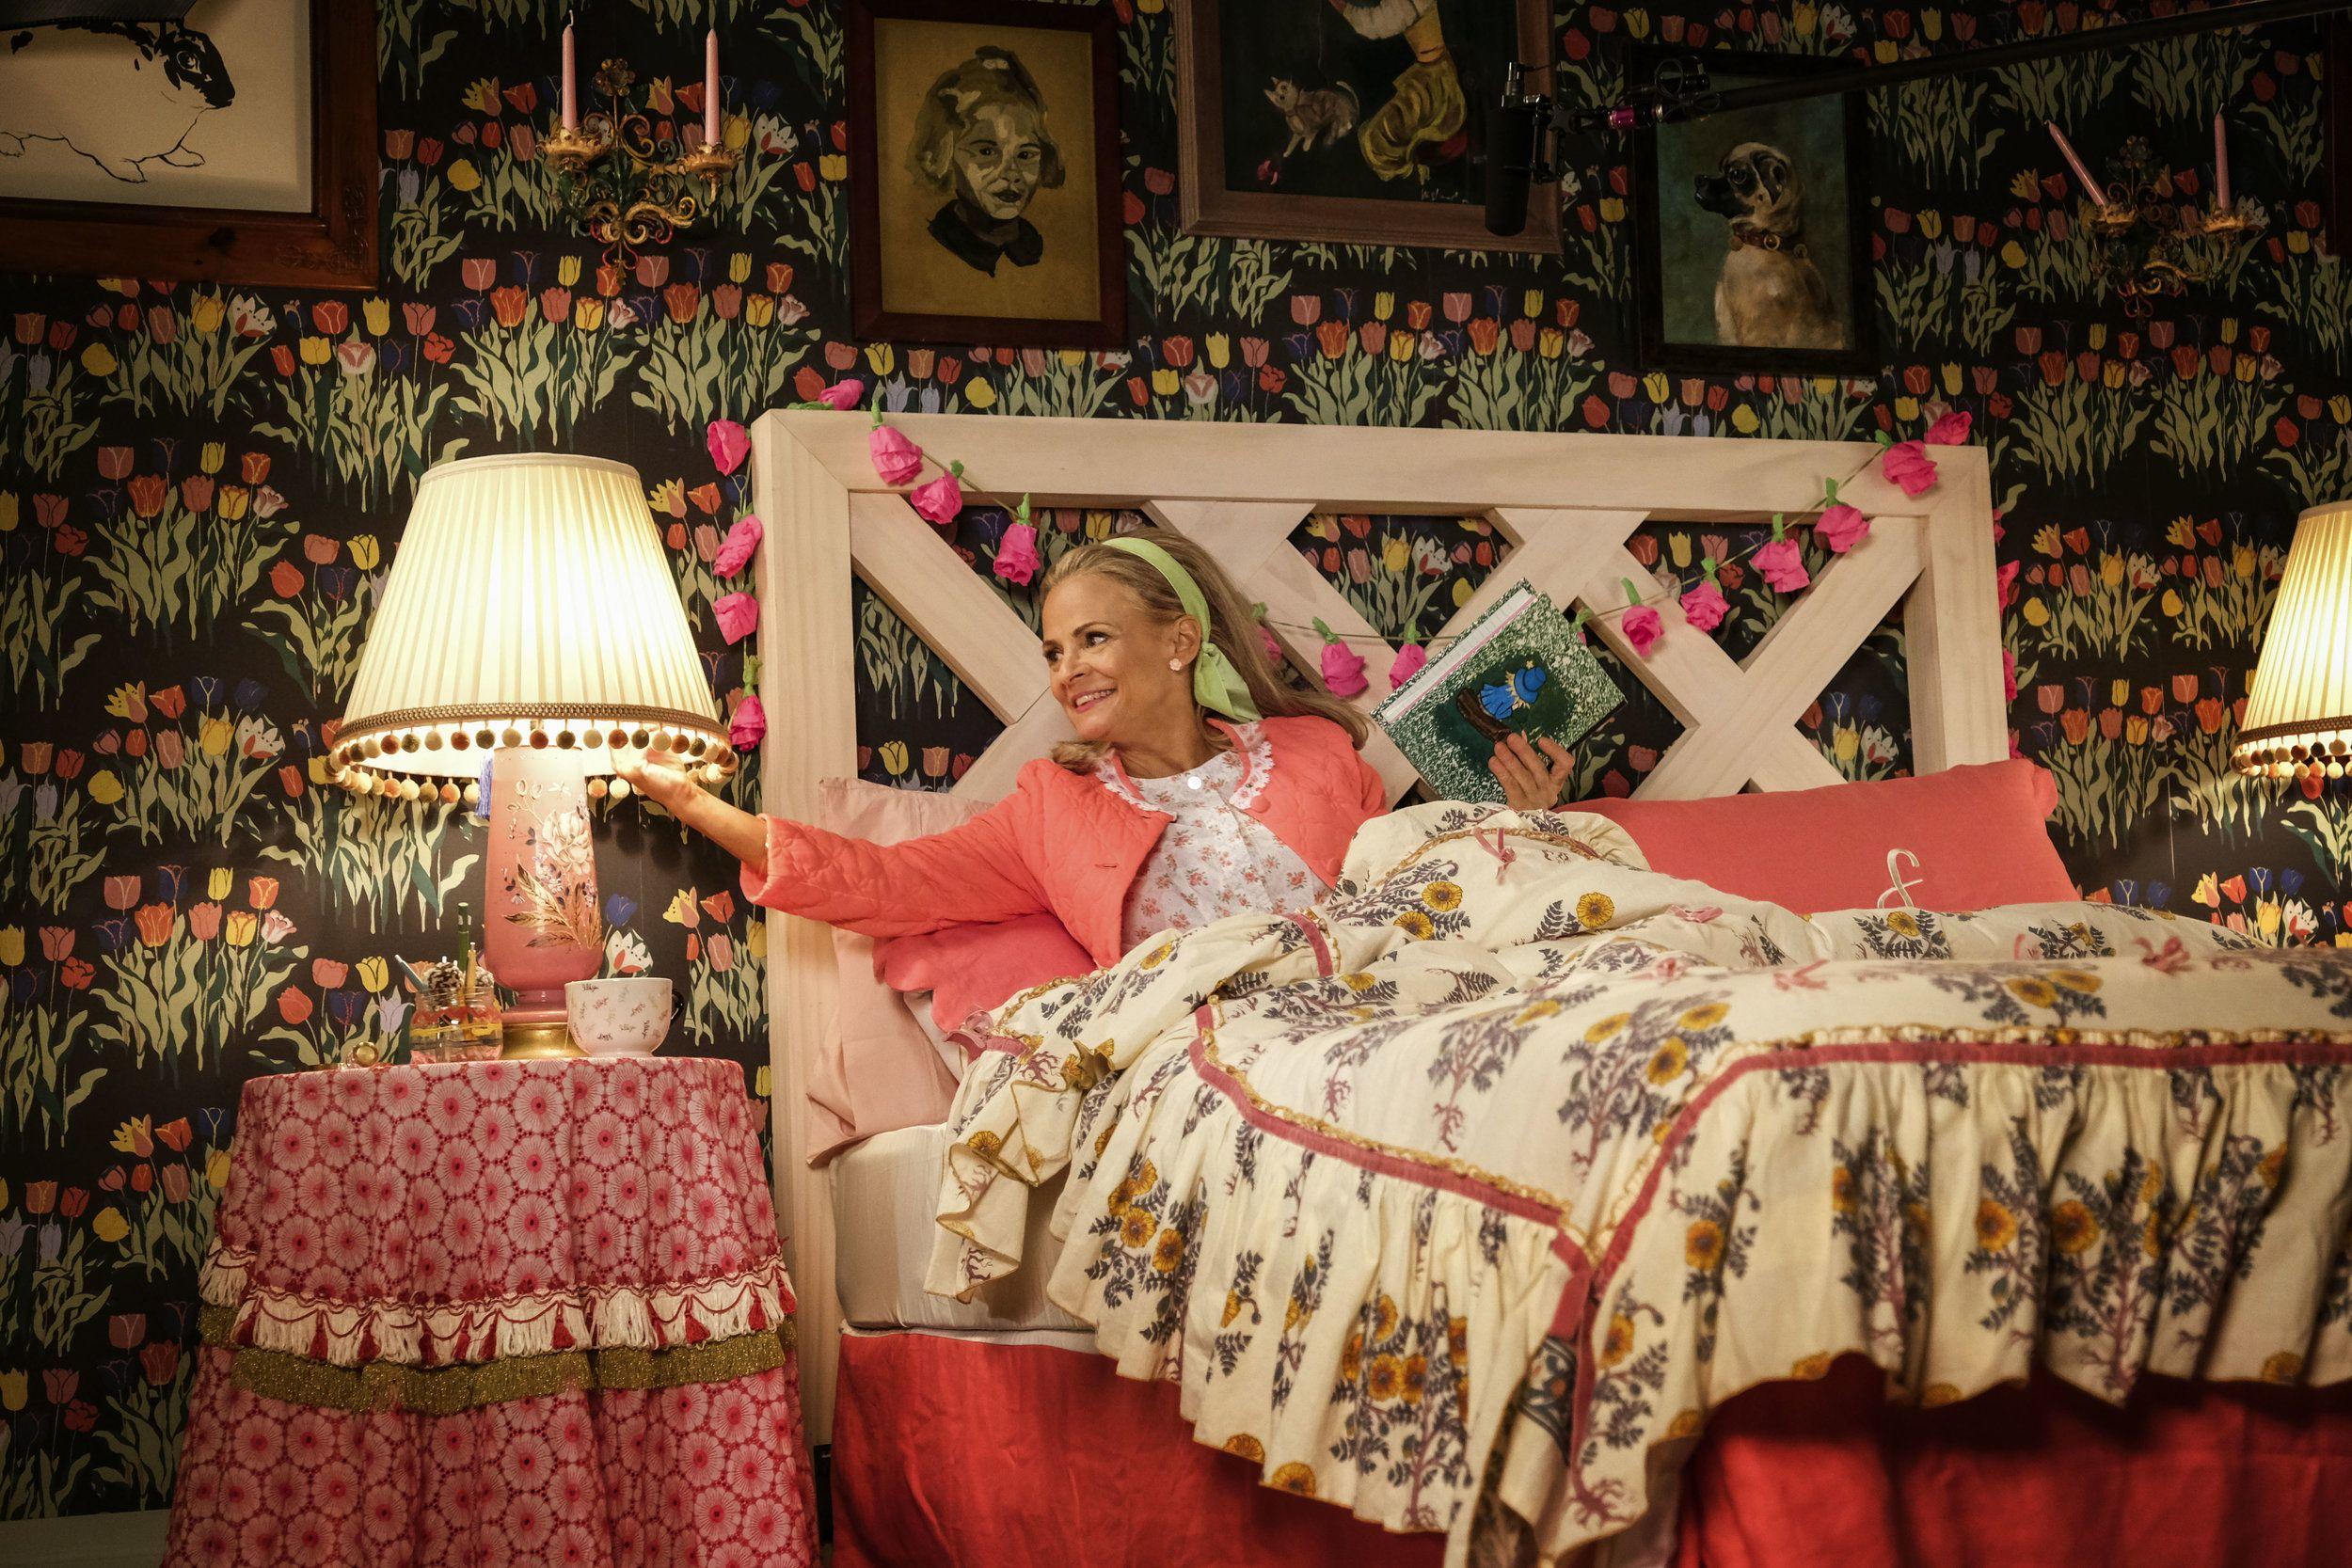 Amy Sedaris Naked amy sedaris talks about at home with amy sedaris season two